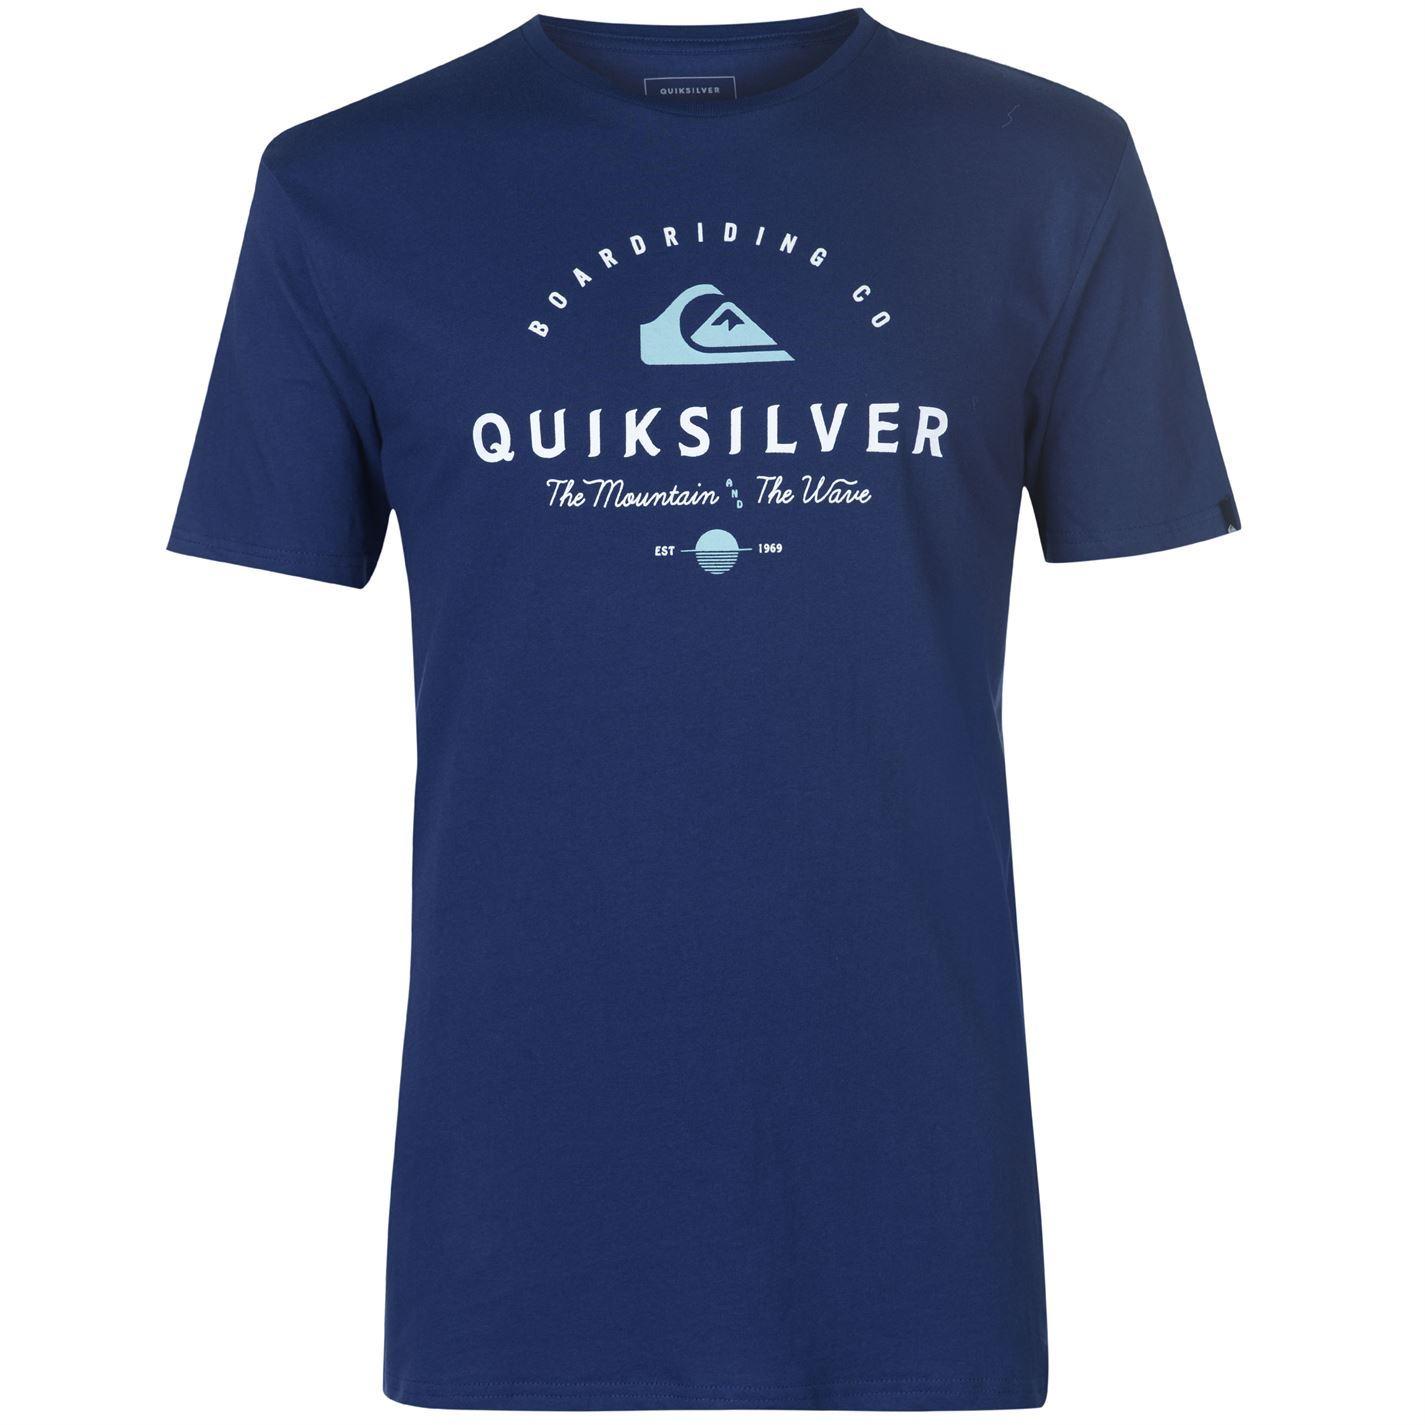 Quiksilver-Working-Man-T-Shirt-Mens-Tee-Shirt-Top thumbnail 4